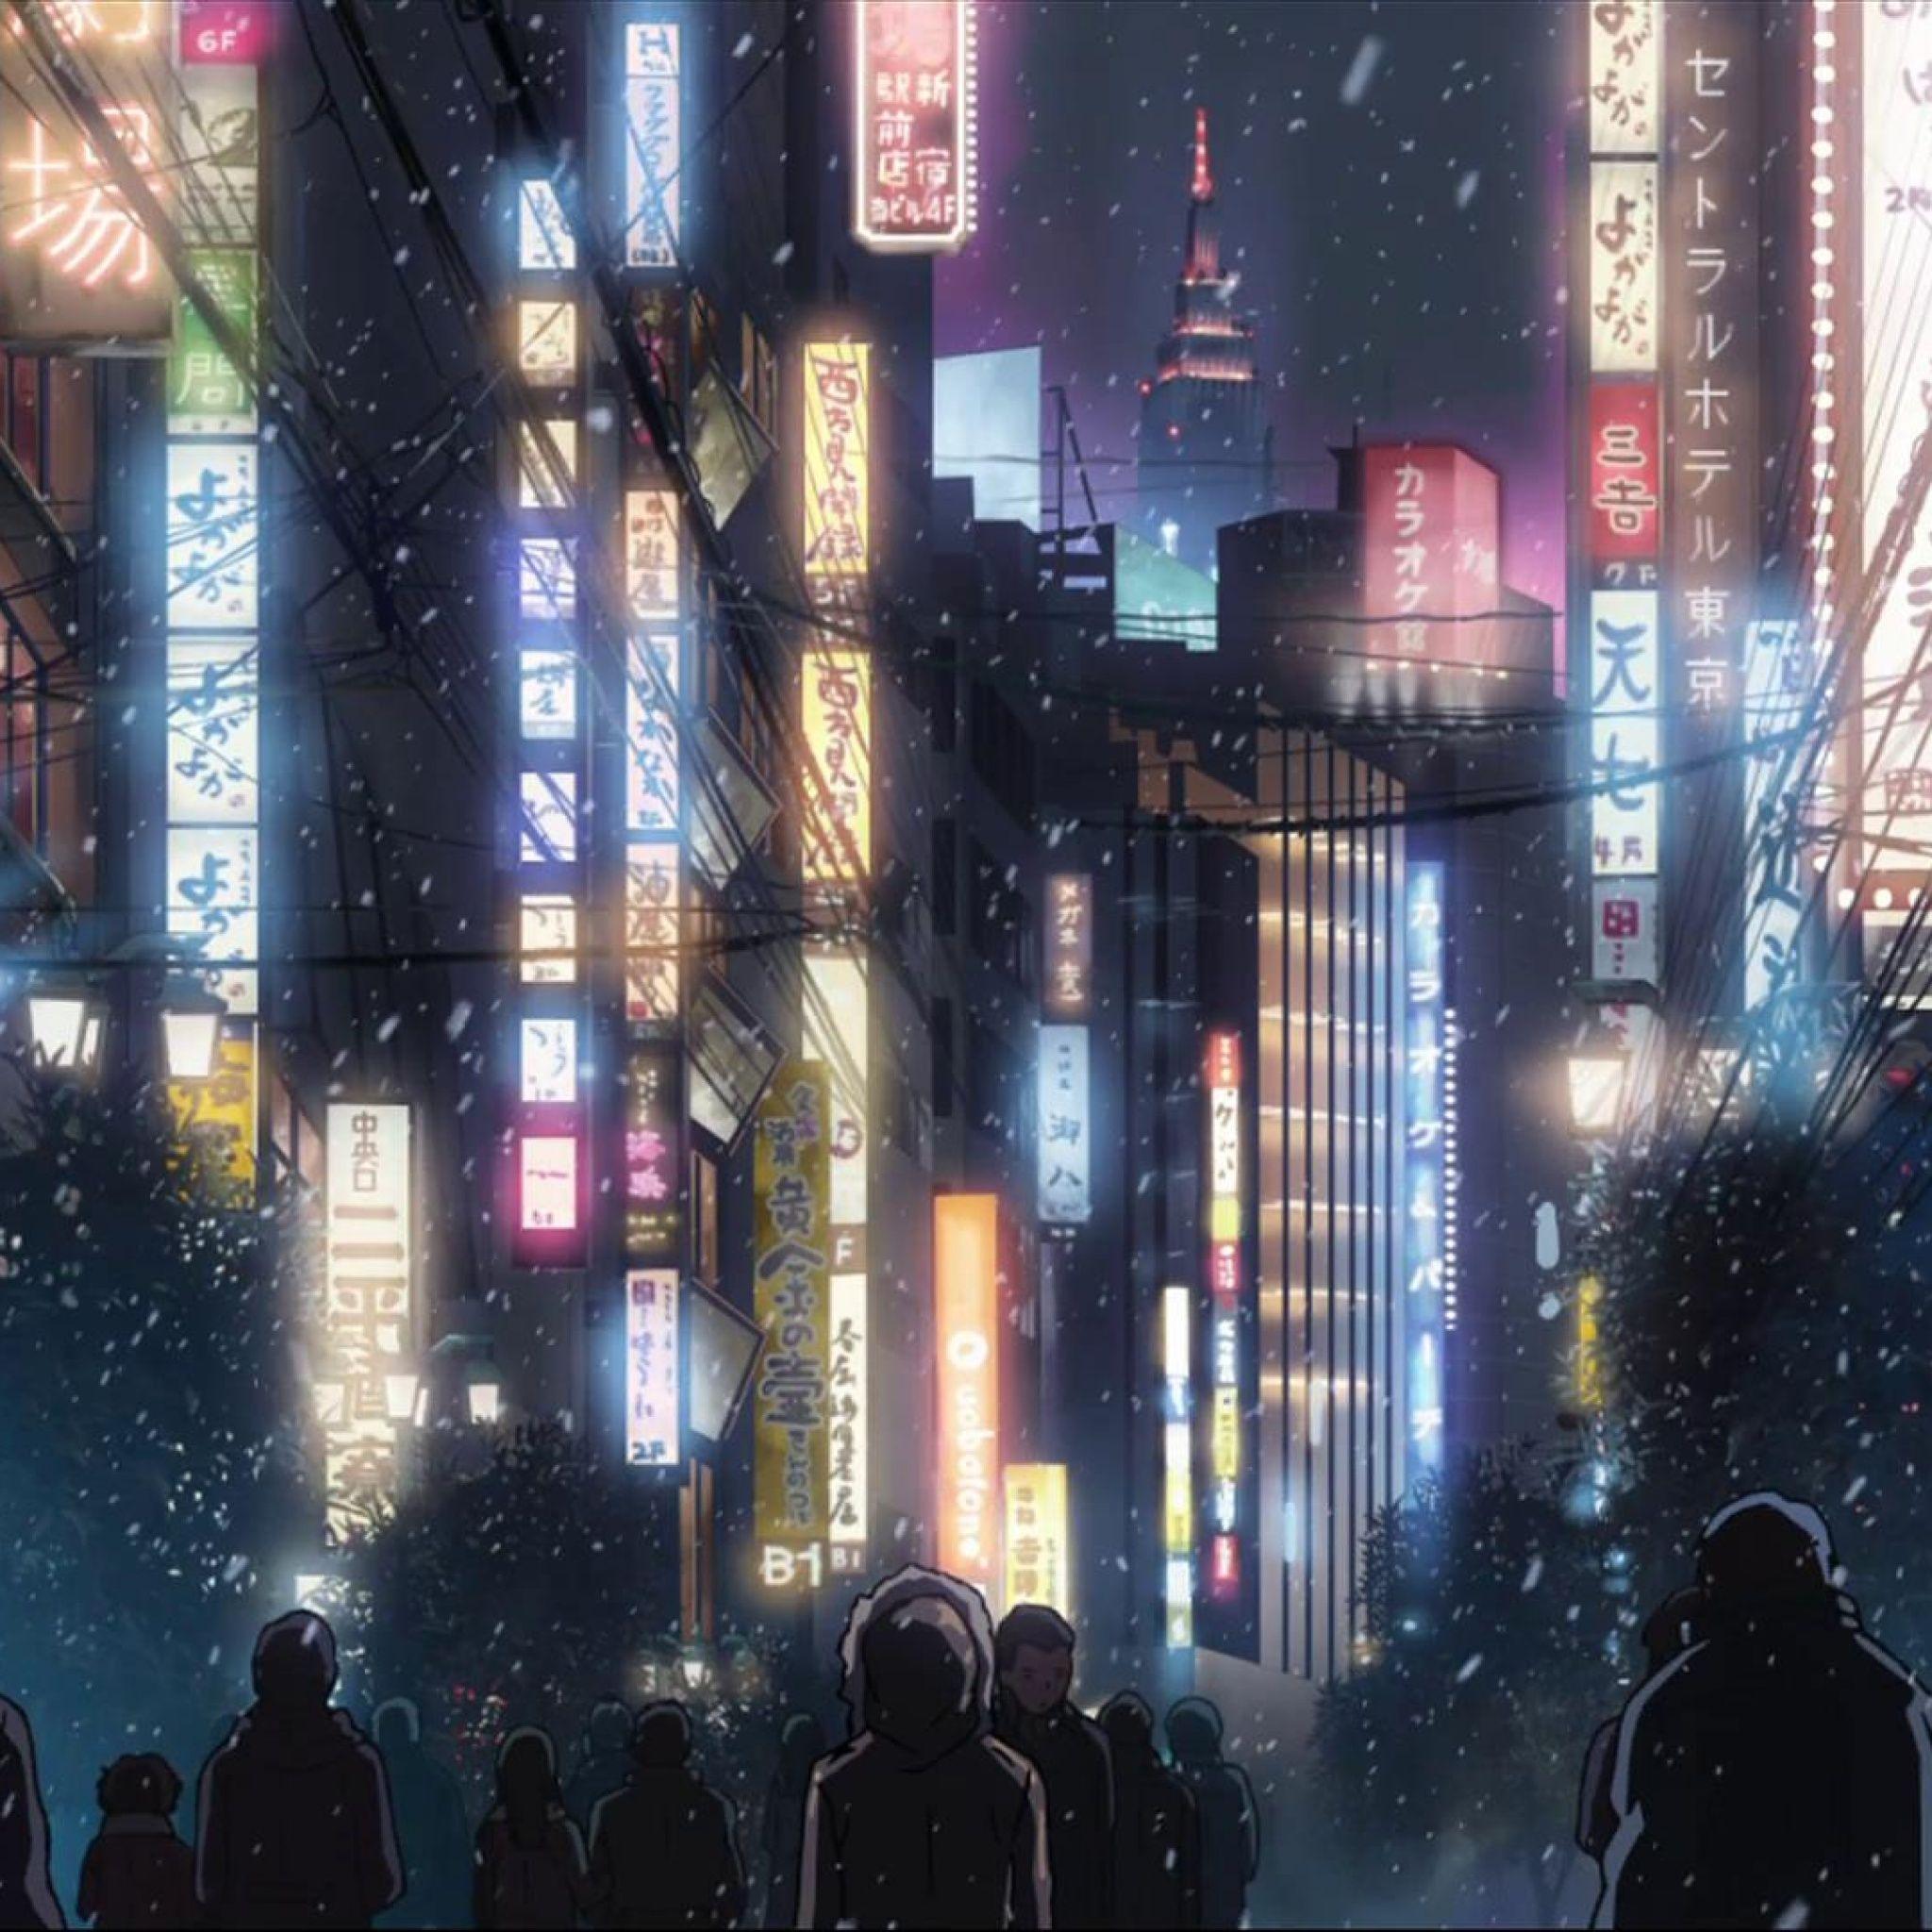 Anime Japan Cityscape Ipad Air Wallpaper Cityscape Wallpaper Anime City Anime Scenery